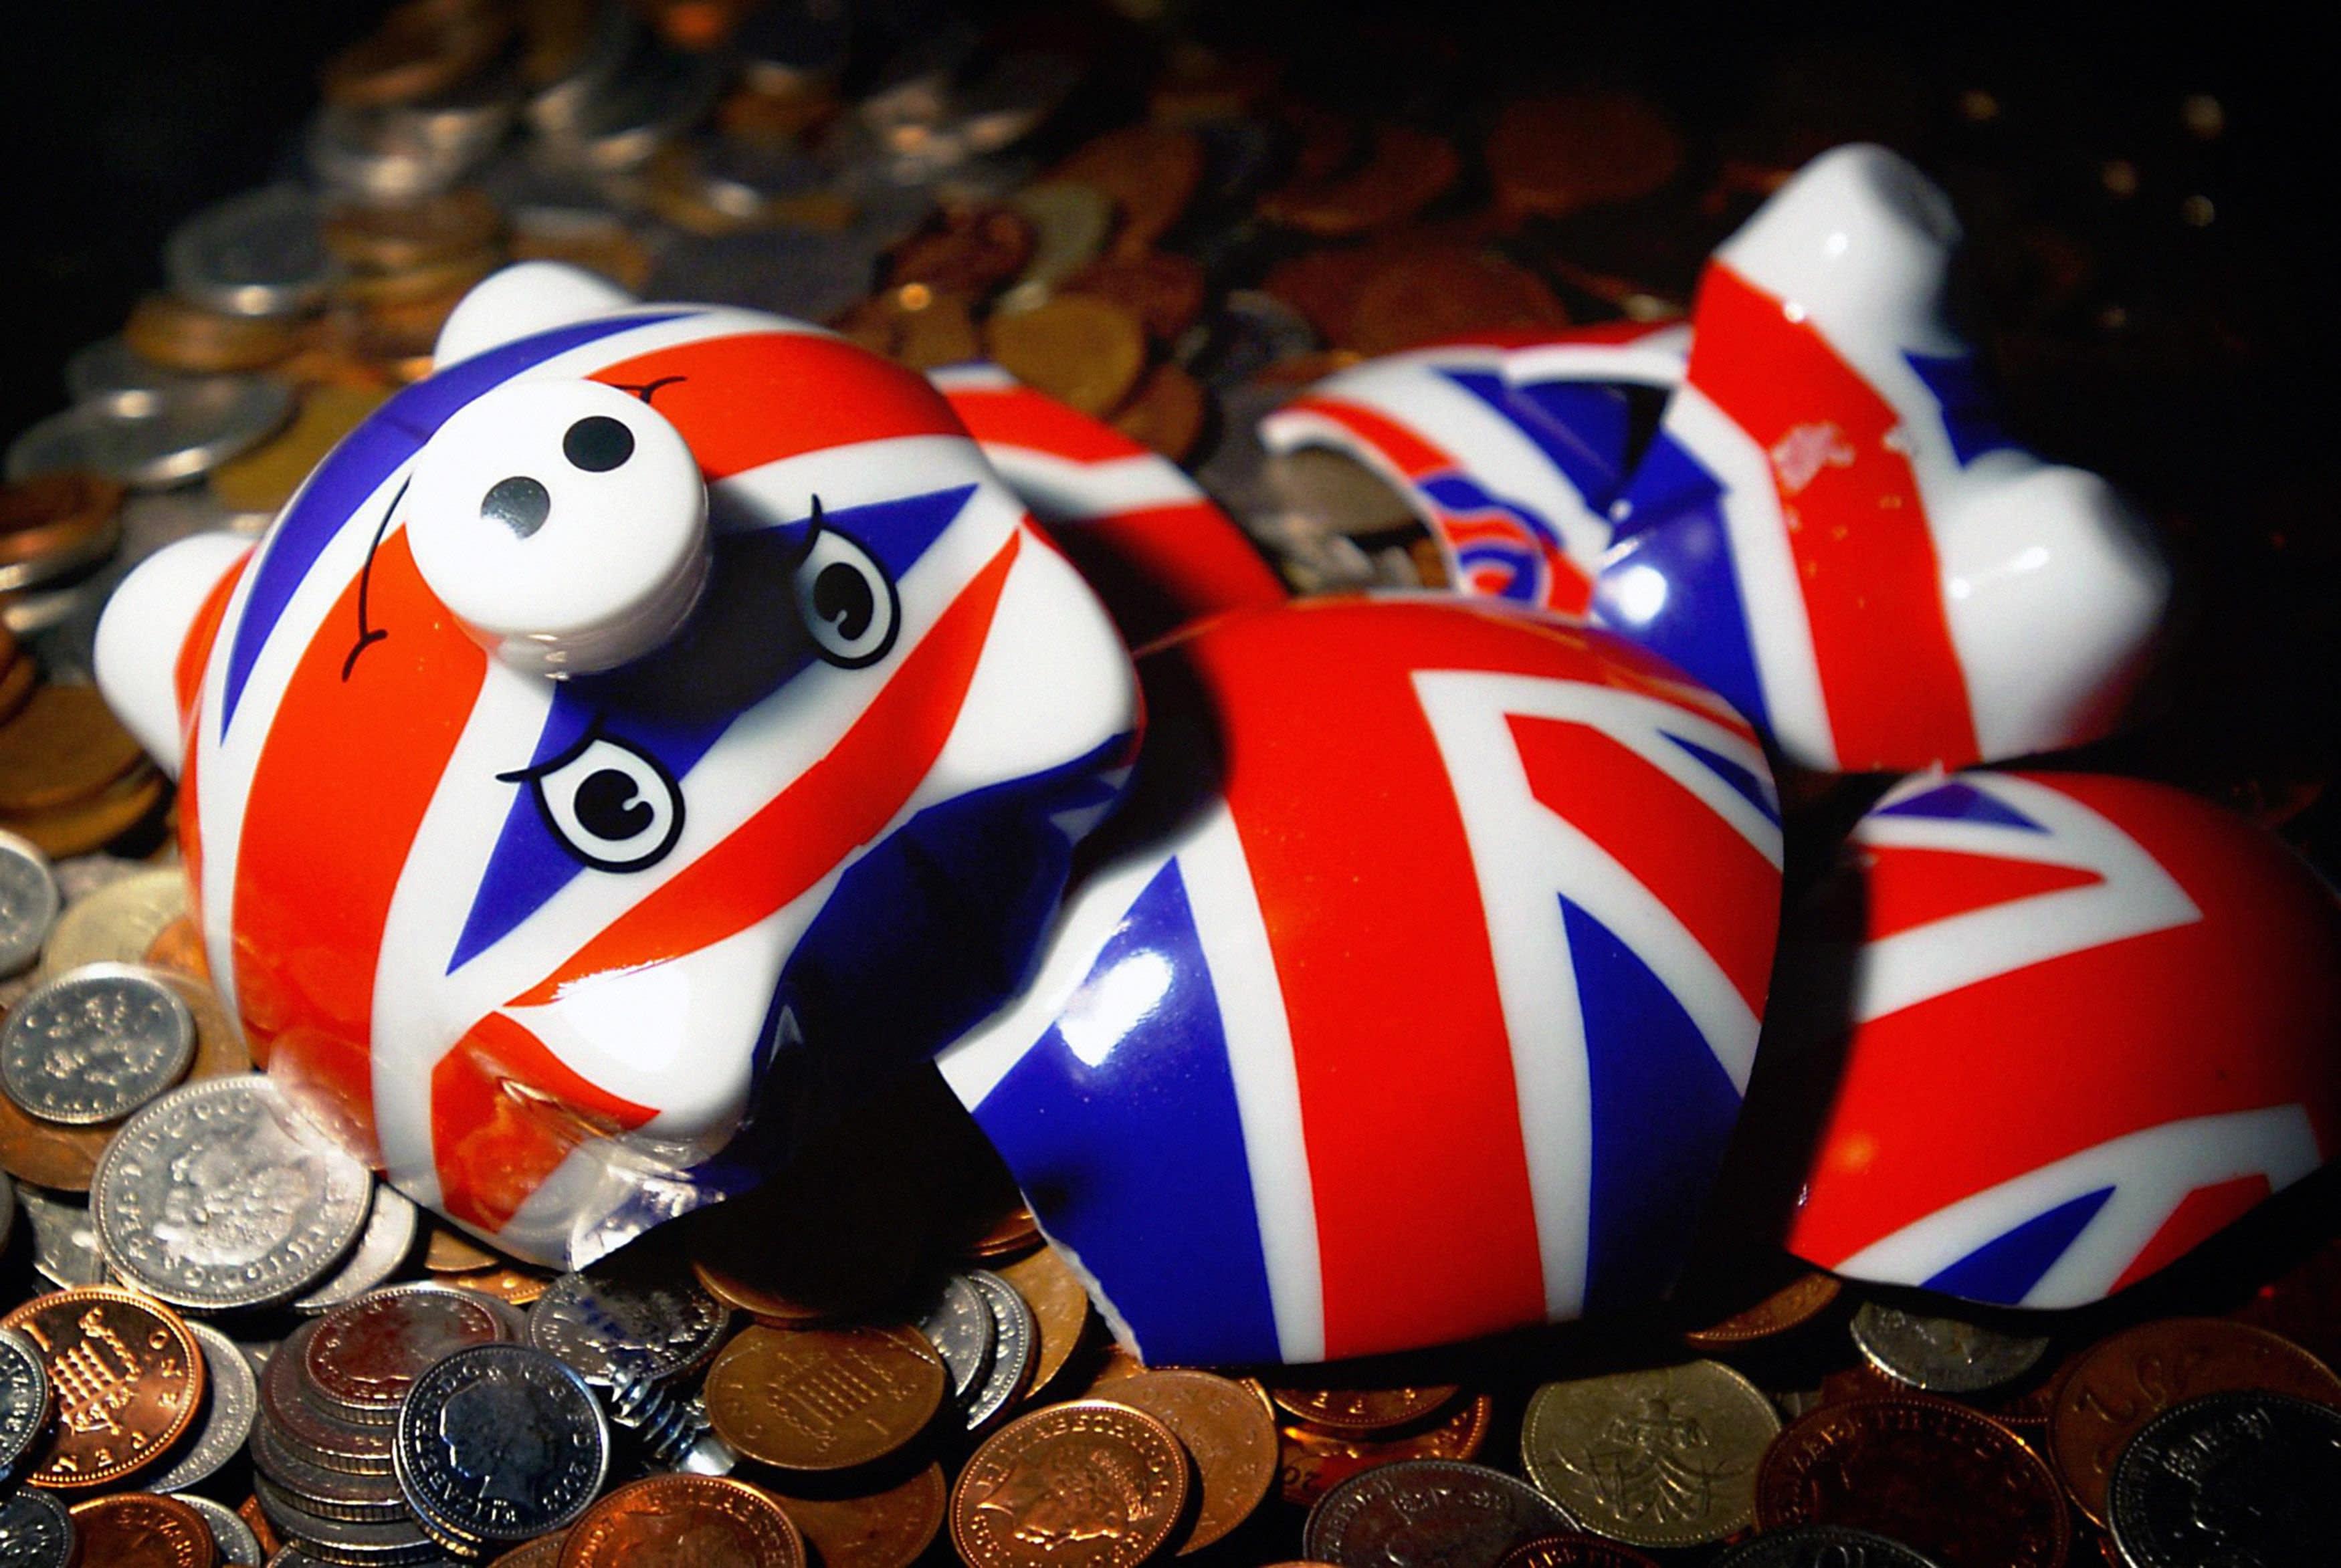 Dividends take 'biggest hit in generations' after 57% plunge